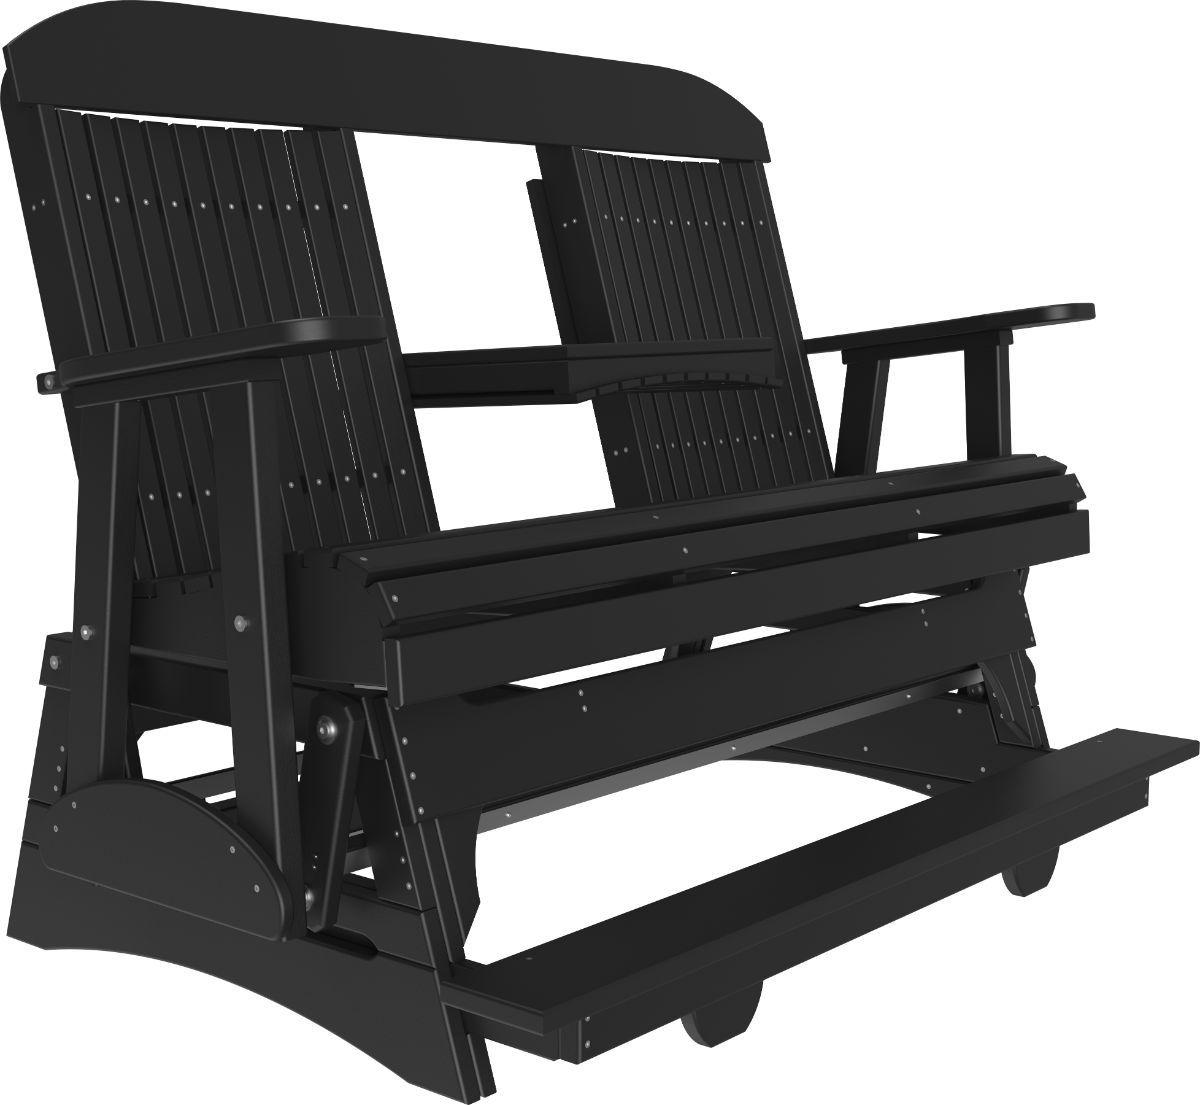 Black Stockton Loveseat Balcony Glider